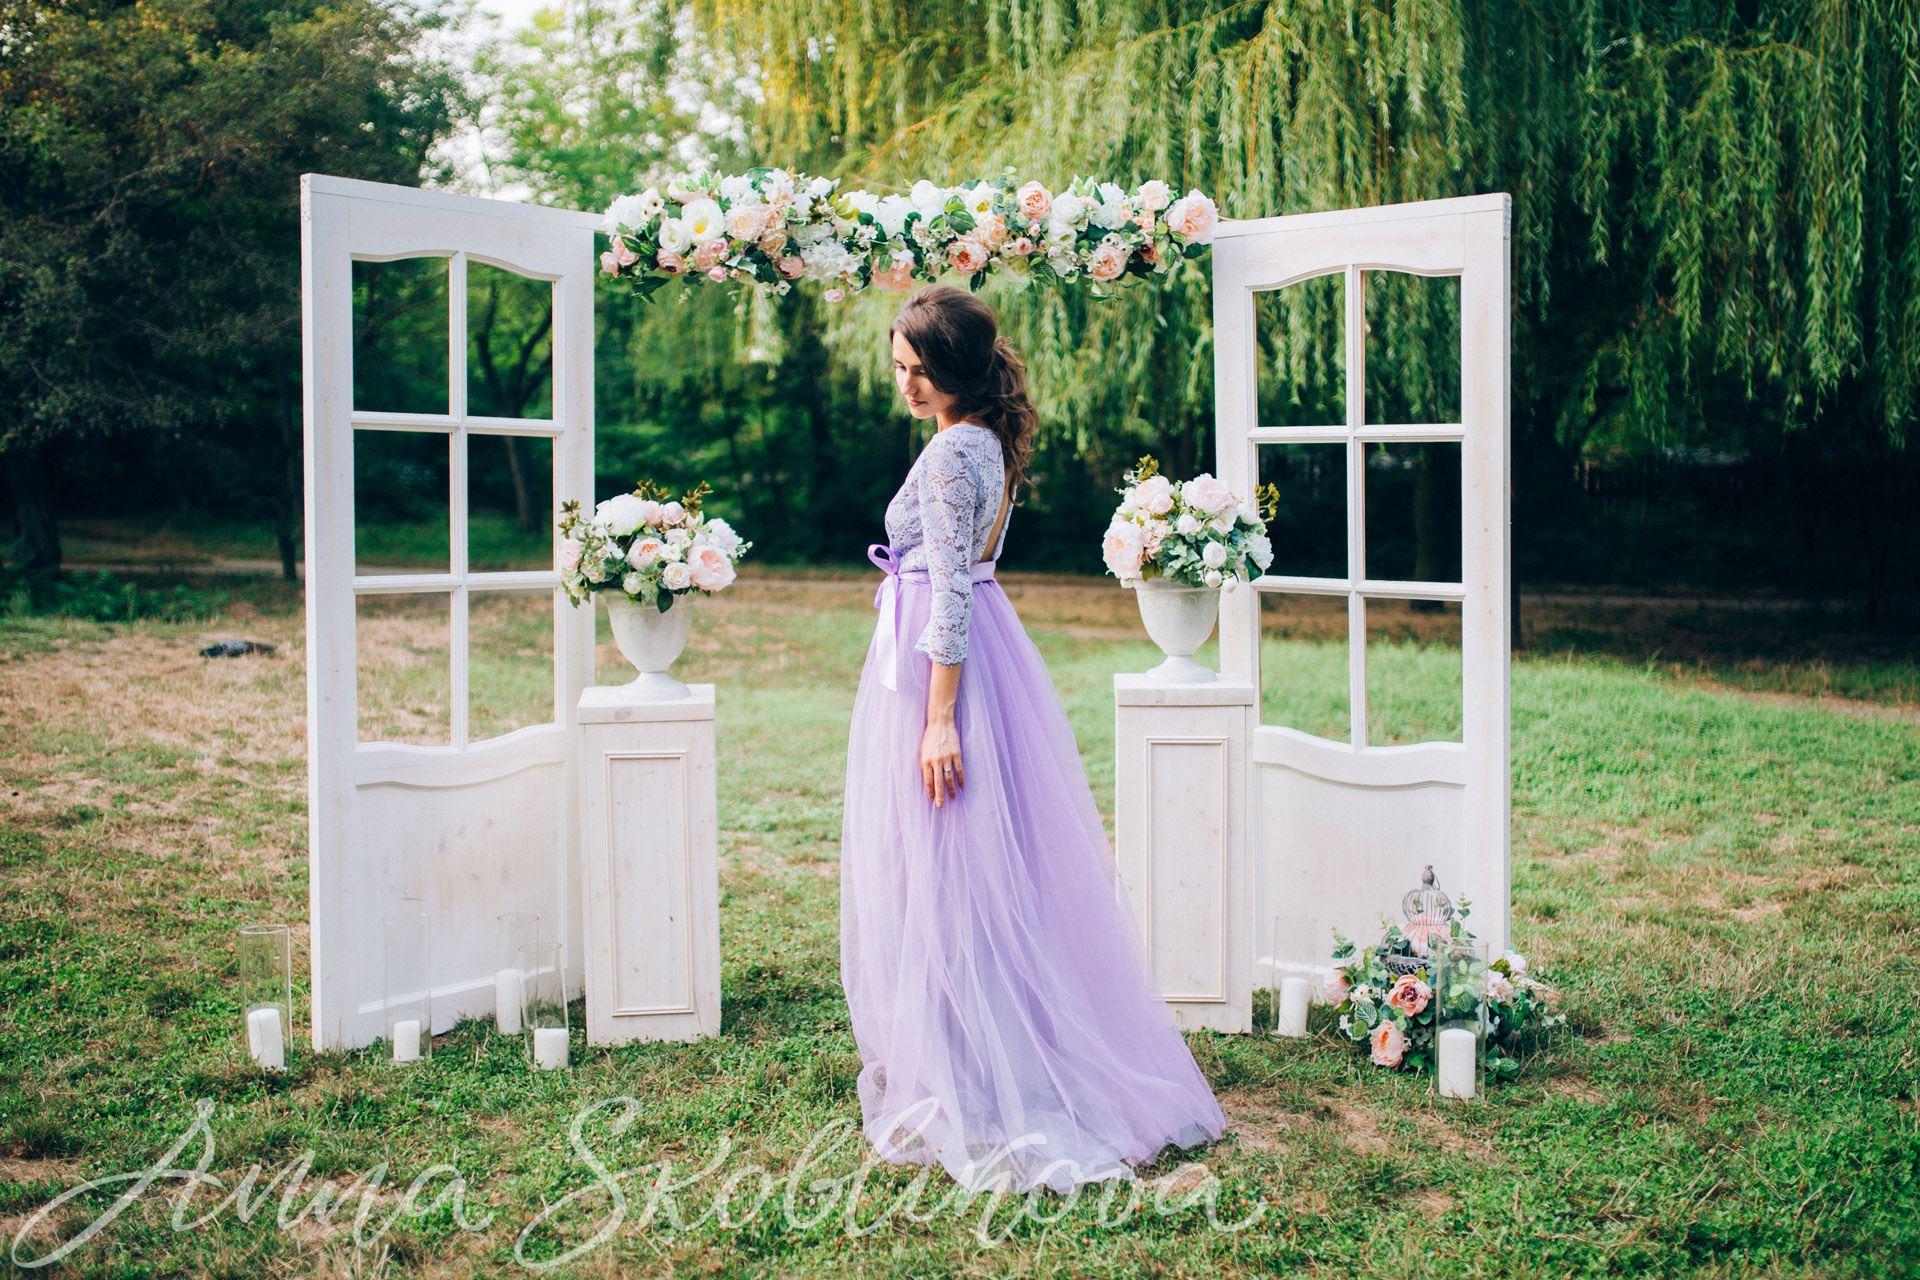 Flowing wedding dress - 0042 / Anna Skoblikova / Julia | Photo 3